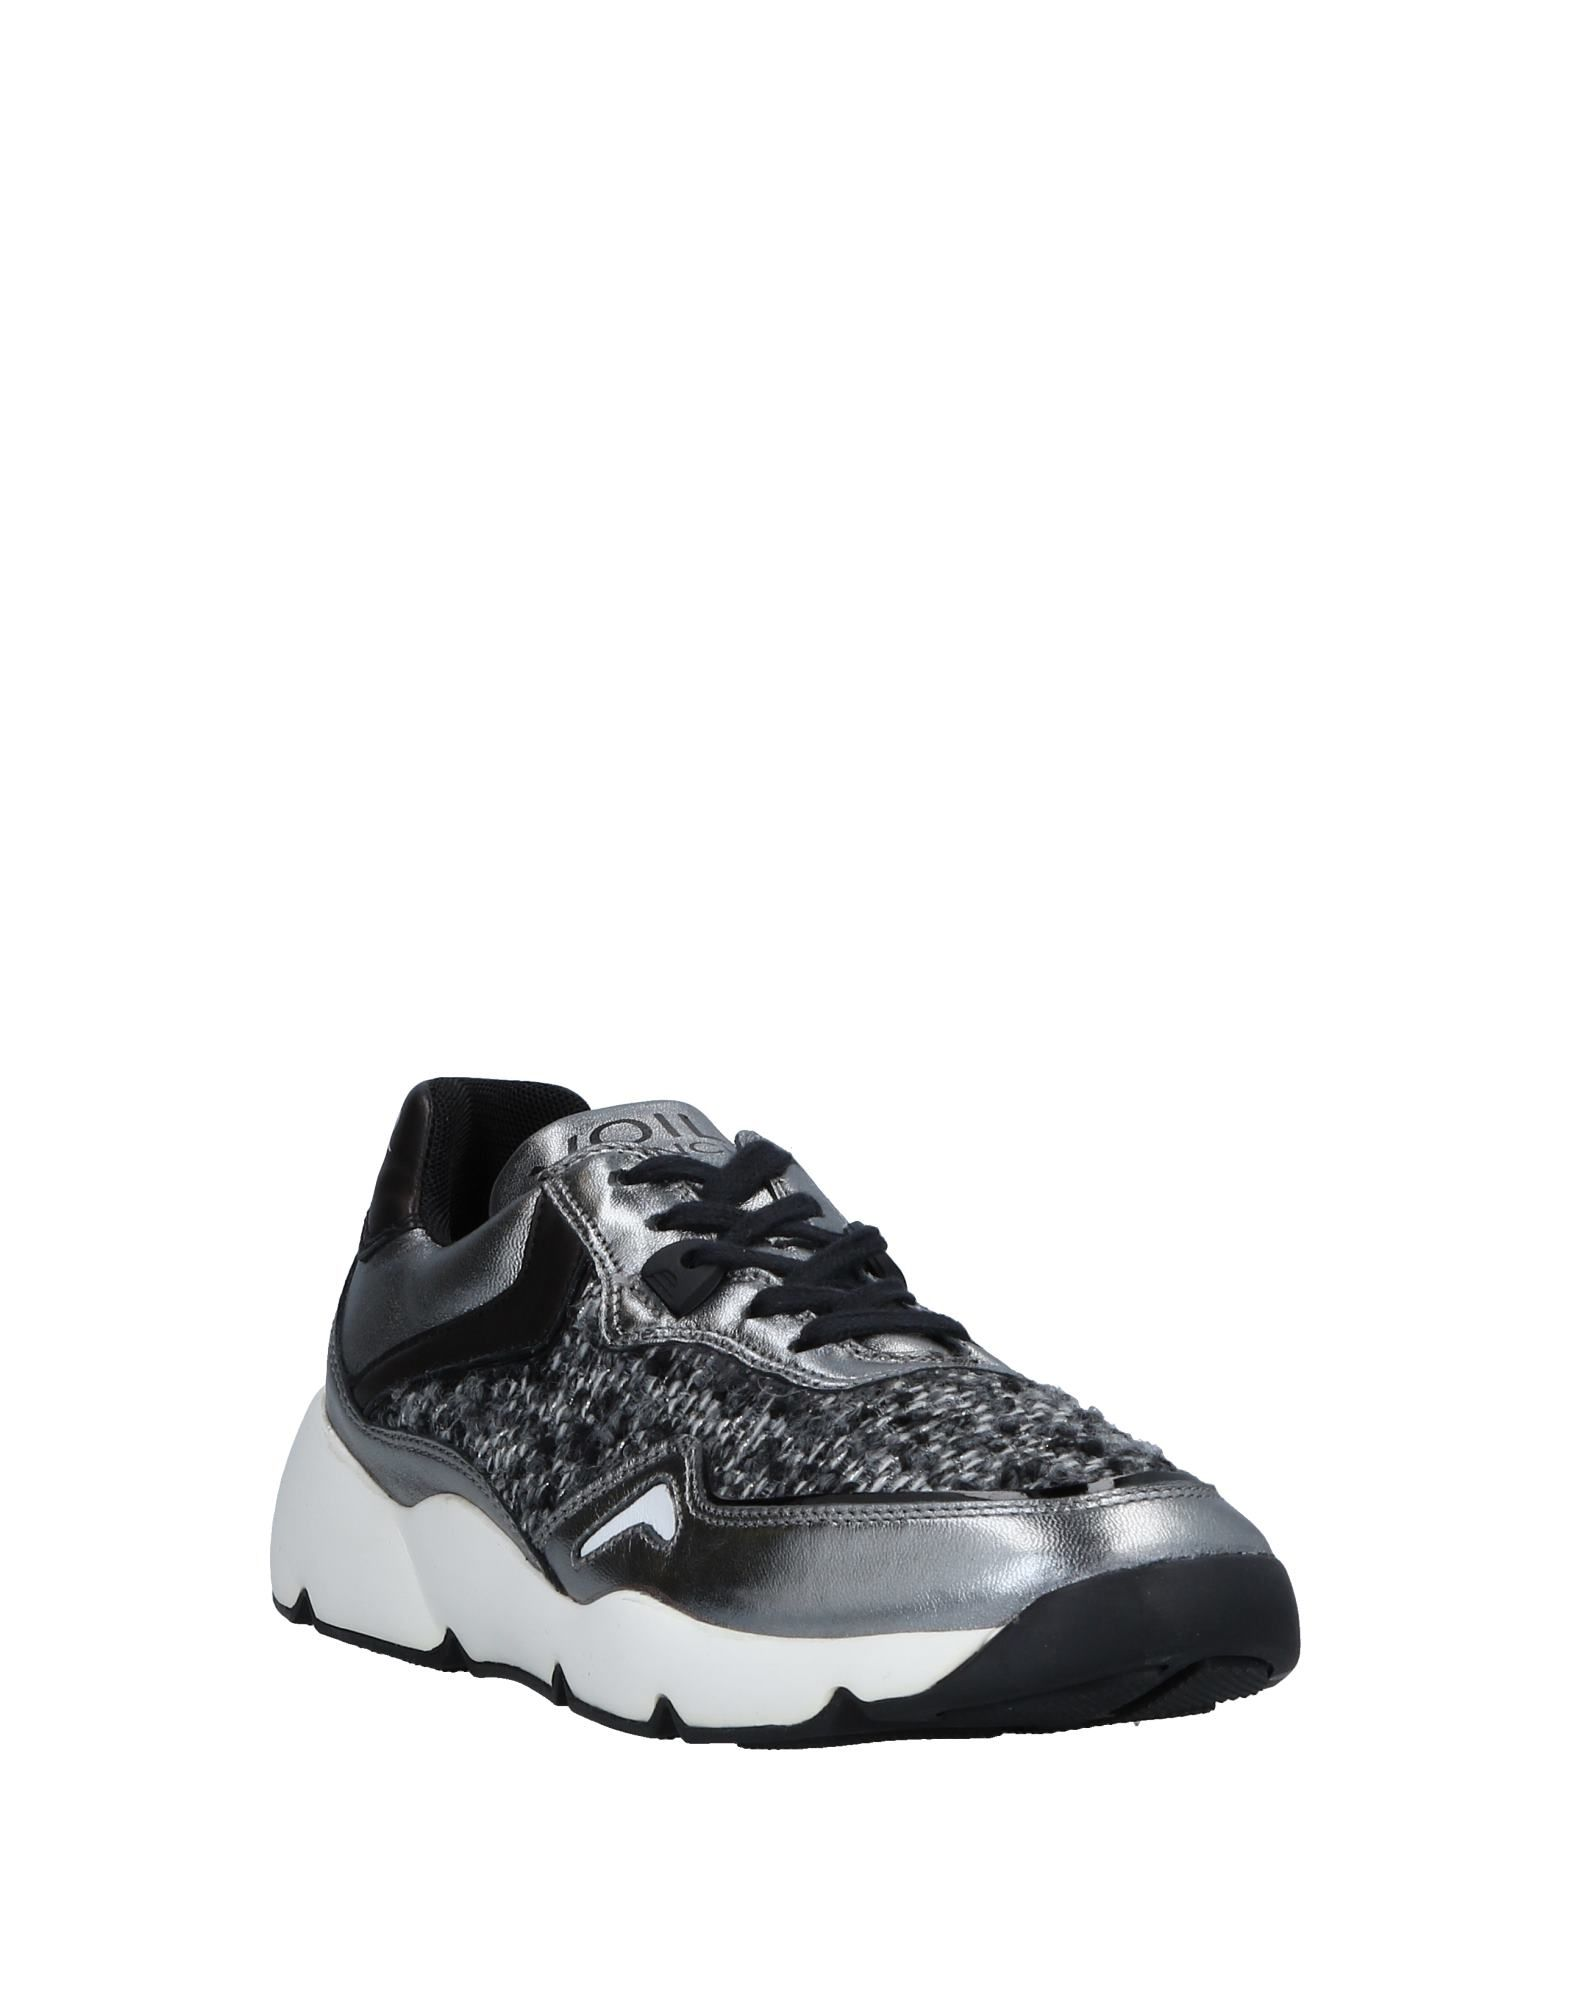 Stilvolle billige Sneakers Schuhe Voile Blanche Sneakers billige Damen  11538382WB 497294